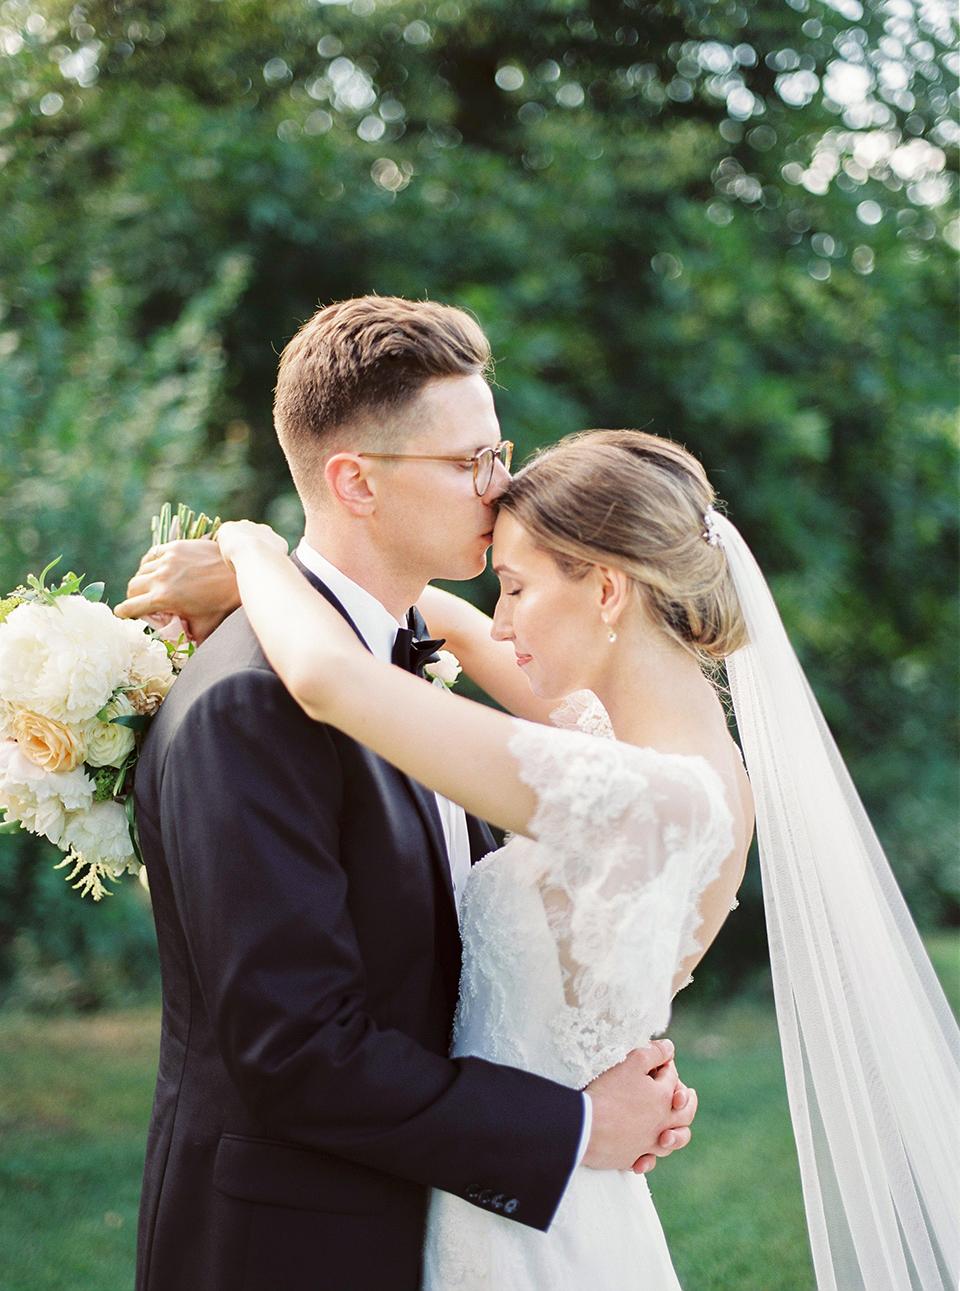 wedding-podcast-destination-wedding-planning (1).jpg